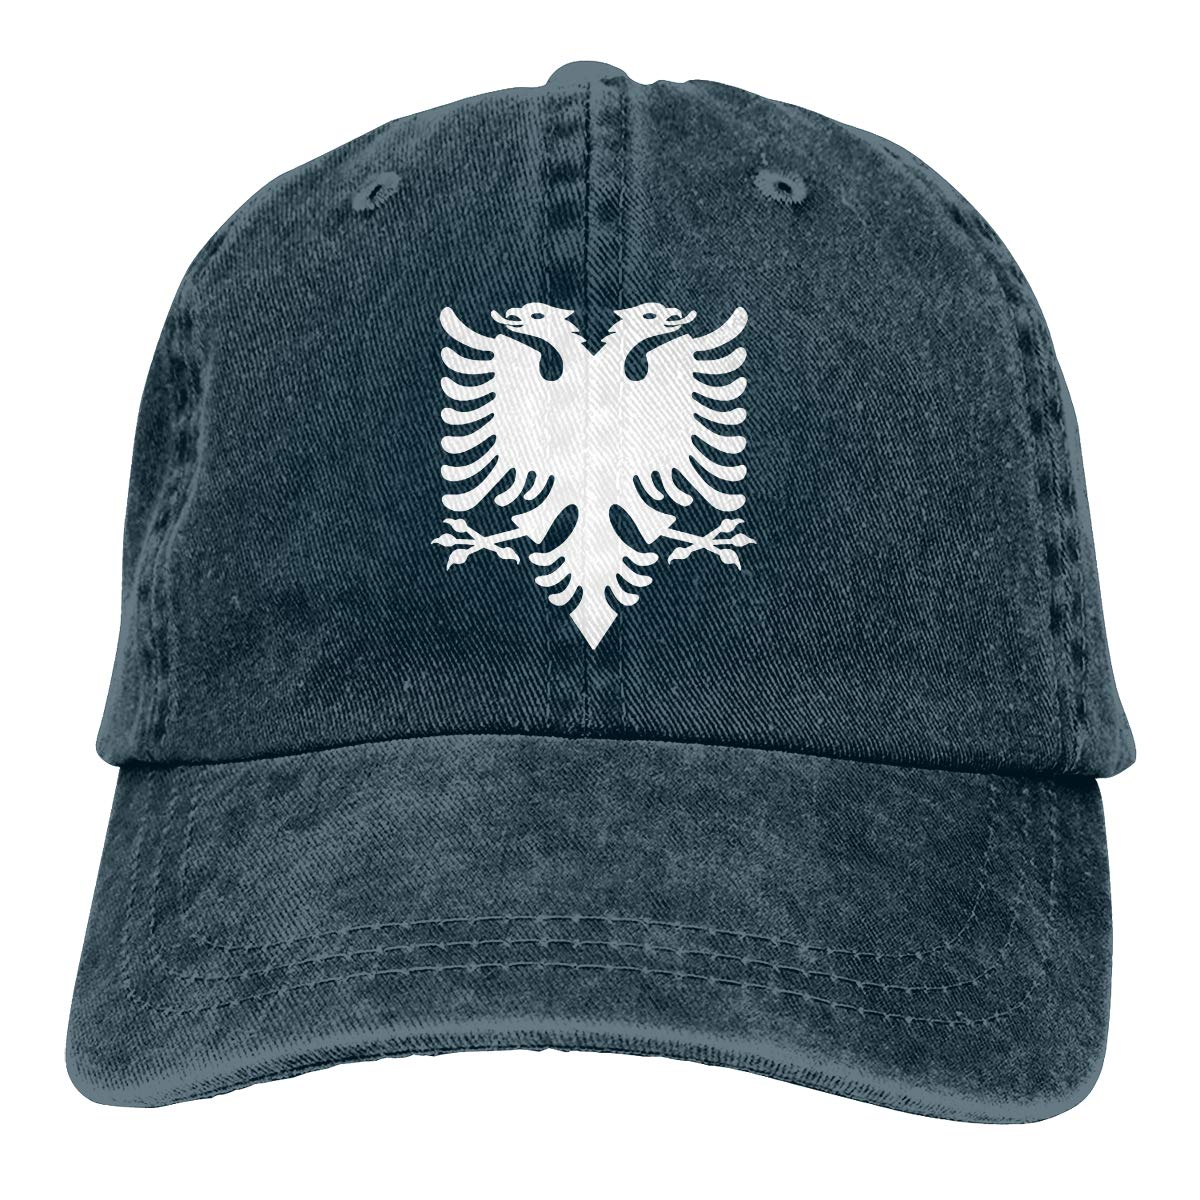 Albanian Eagle Grunge Fashion Adjustable Cowboy Cap Baseball Cap for Women and Men